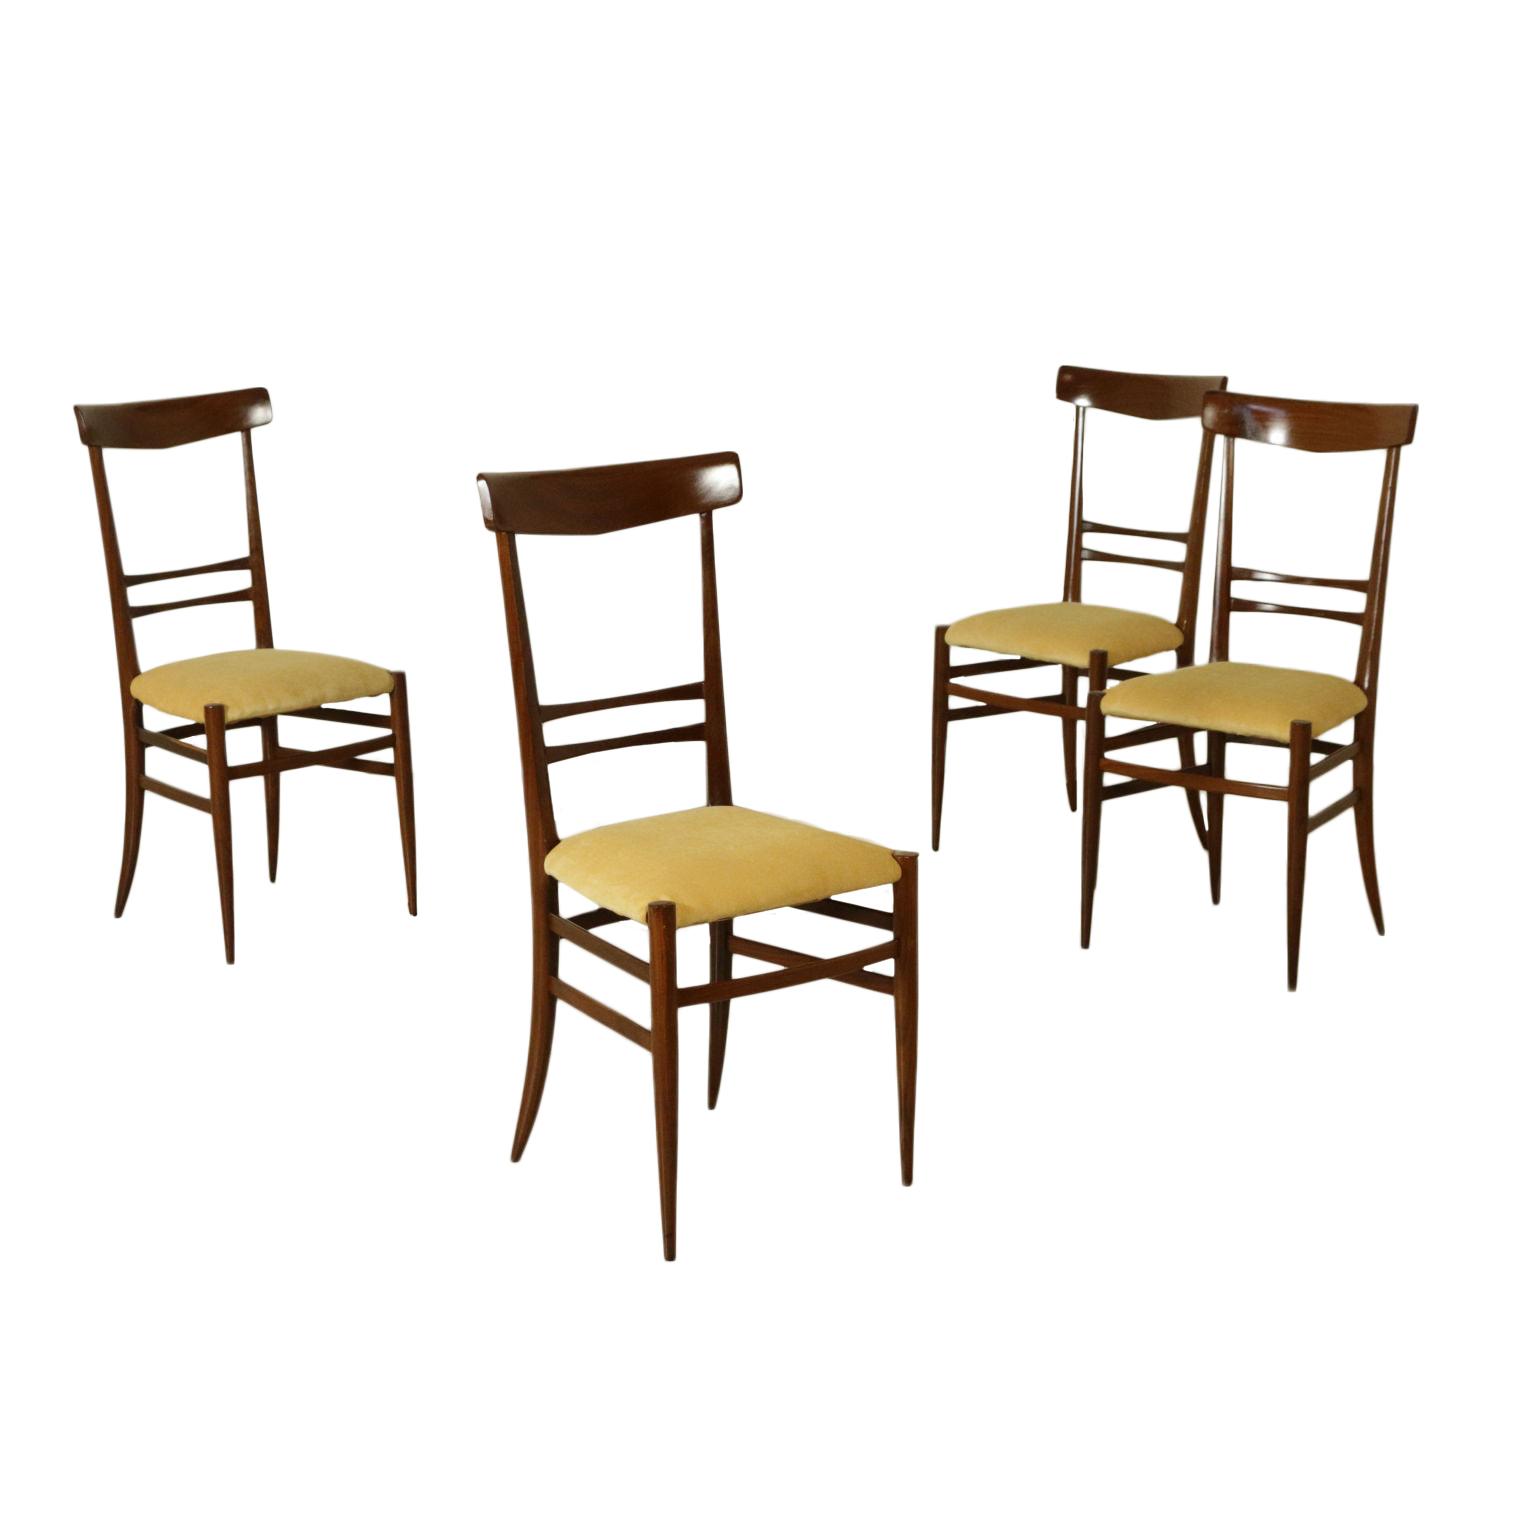 Gruppo 4 sedie design architetto gambarelli modernariato for Sedie design vintage